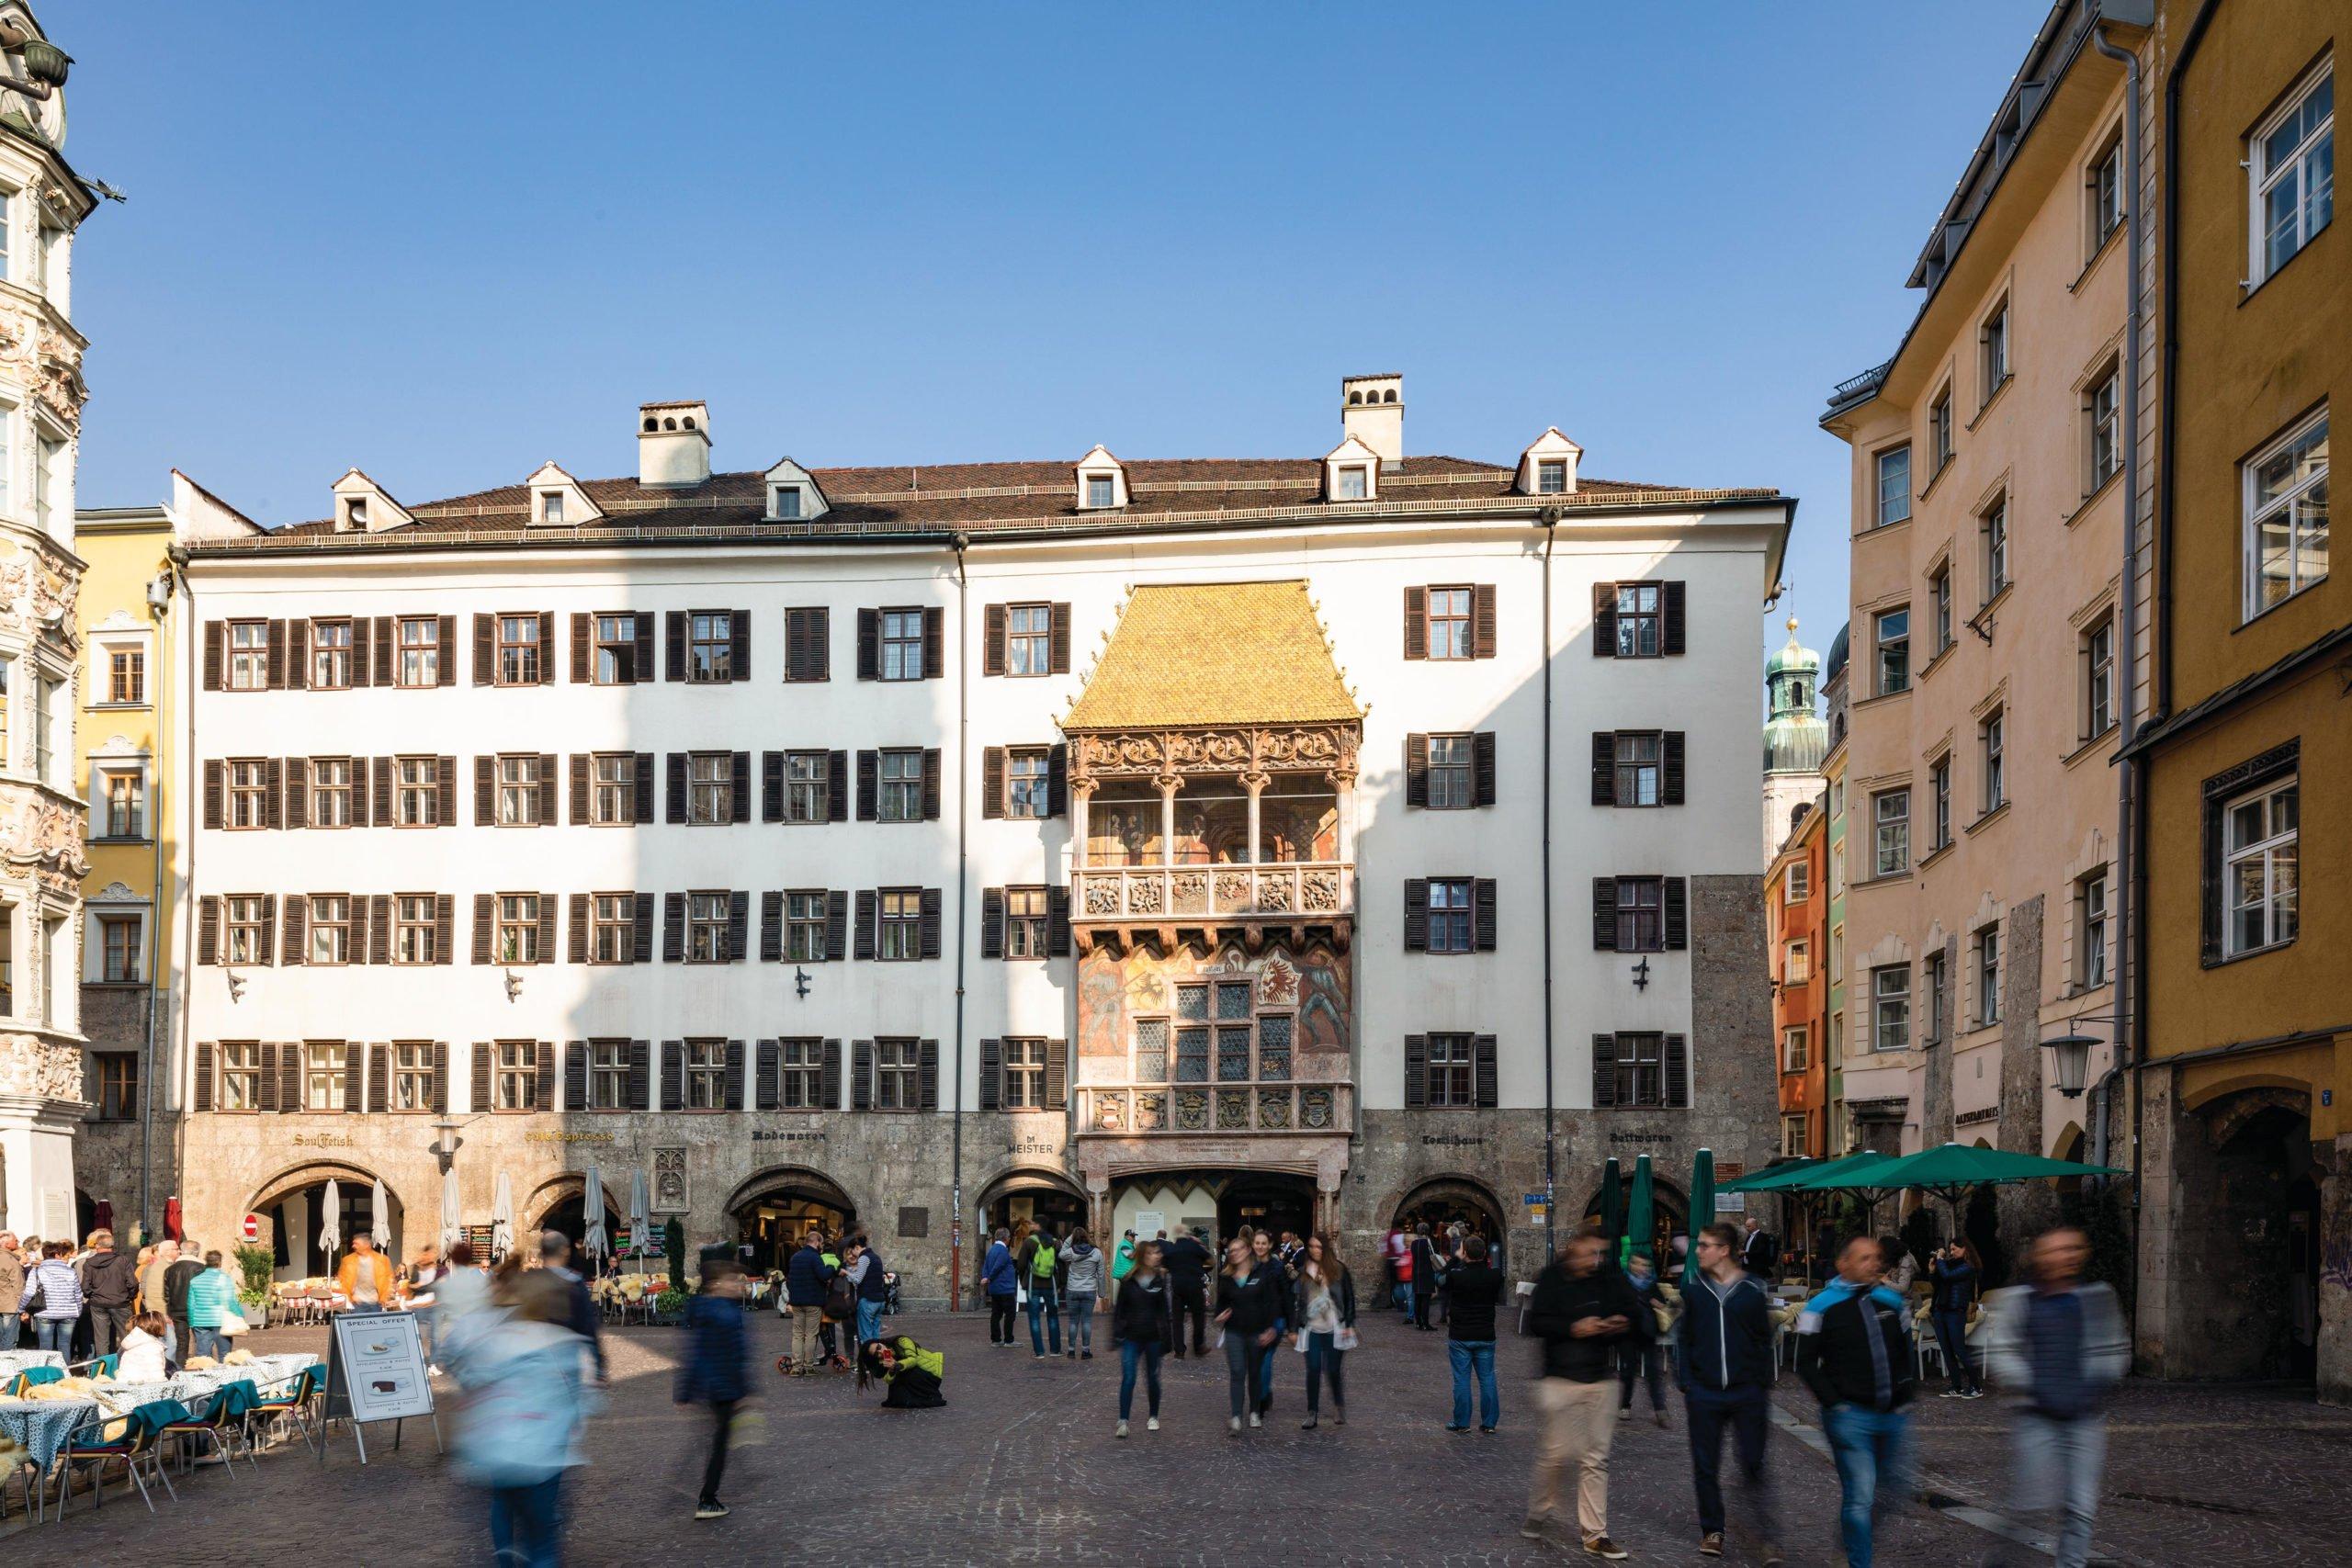 Goldenes Dachl Things To Do in Innsbruck